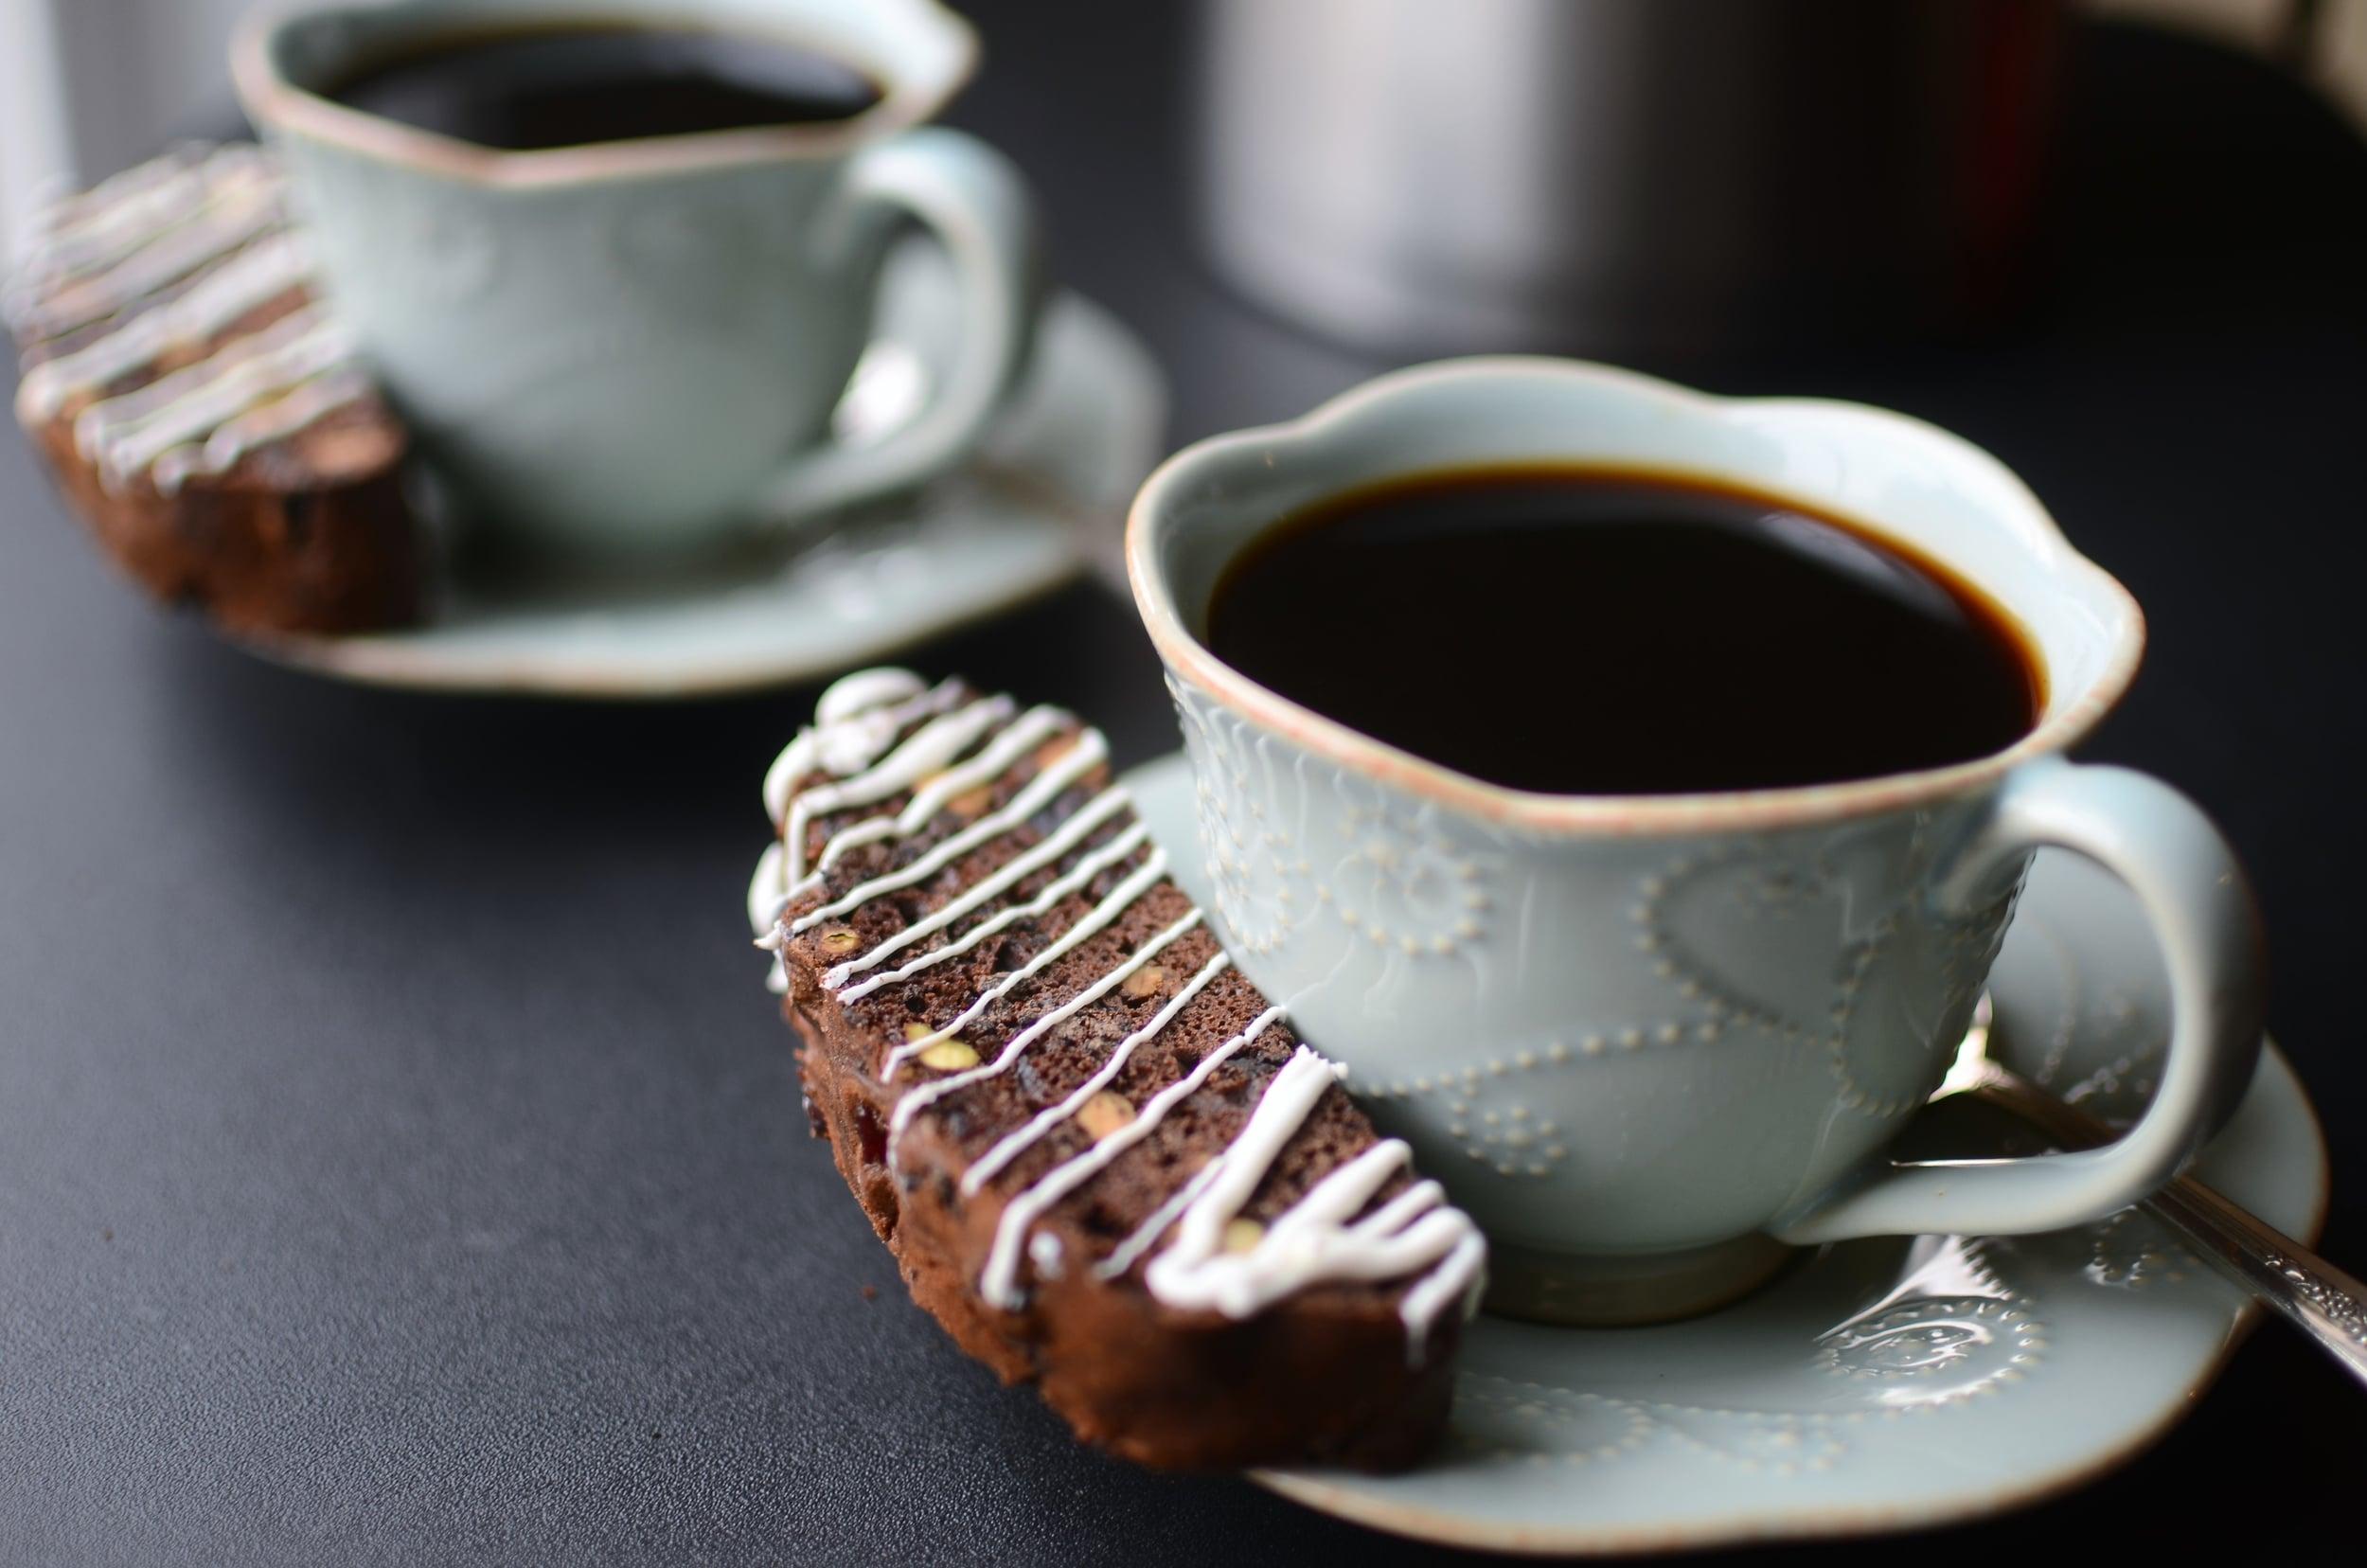 Chocolate Pistachio Biscotti Recipe WITH PHOTOS